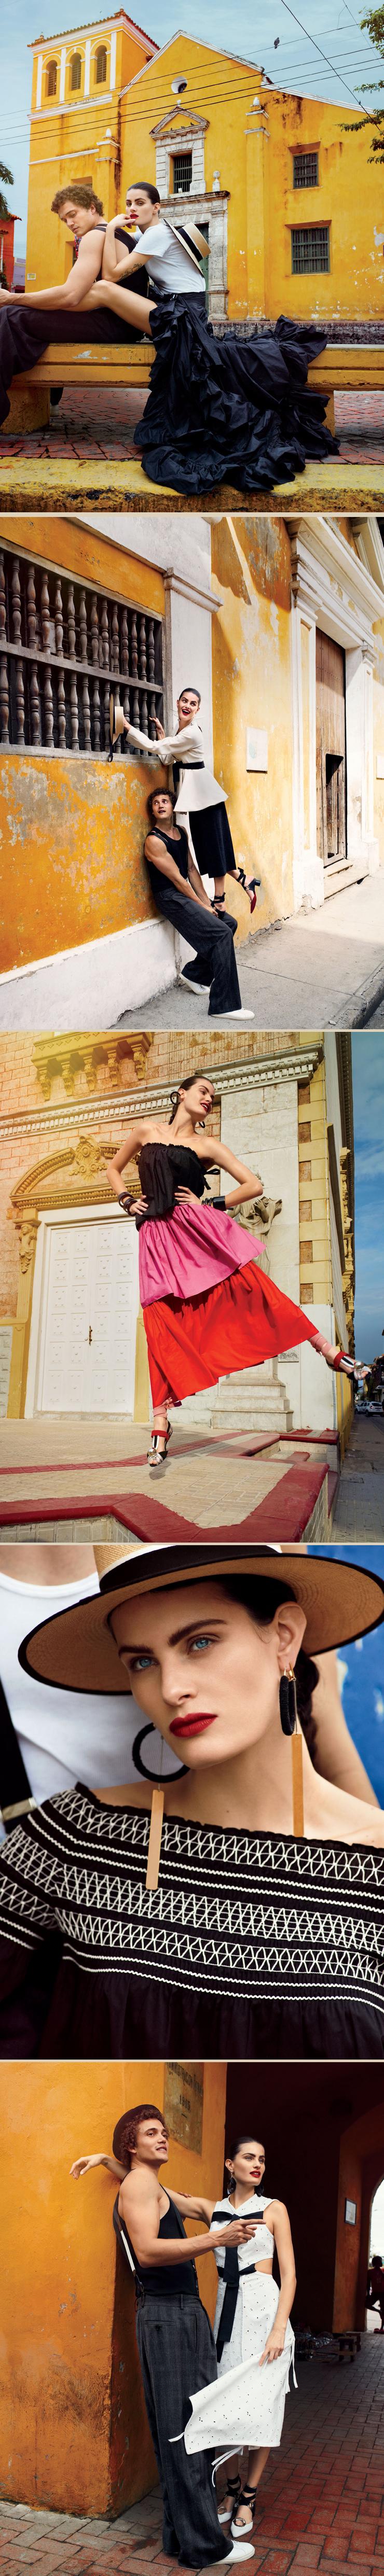 Mood Latino - Cleon Gostinski - Fonte Fashion House Global